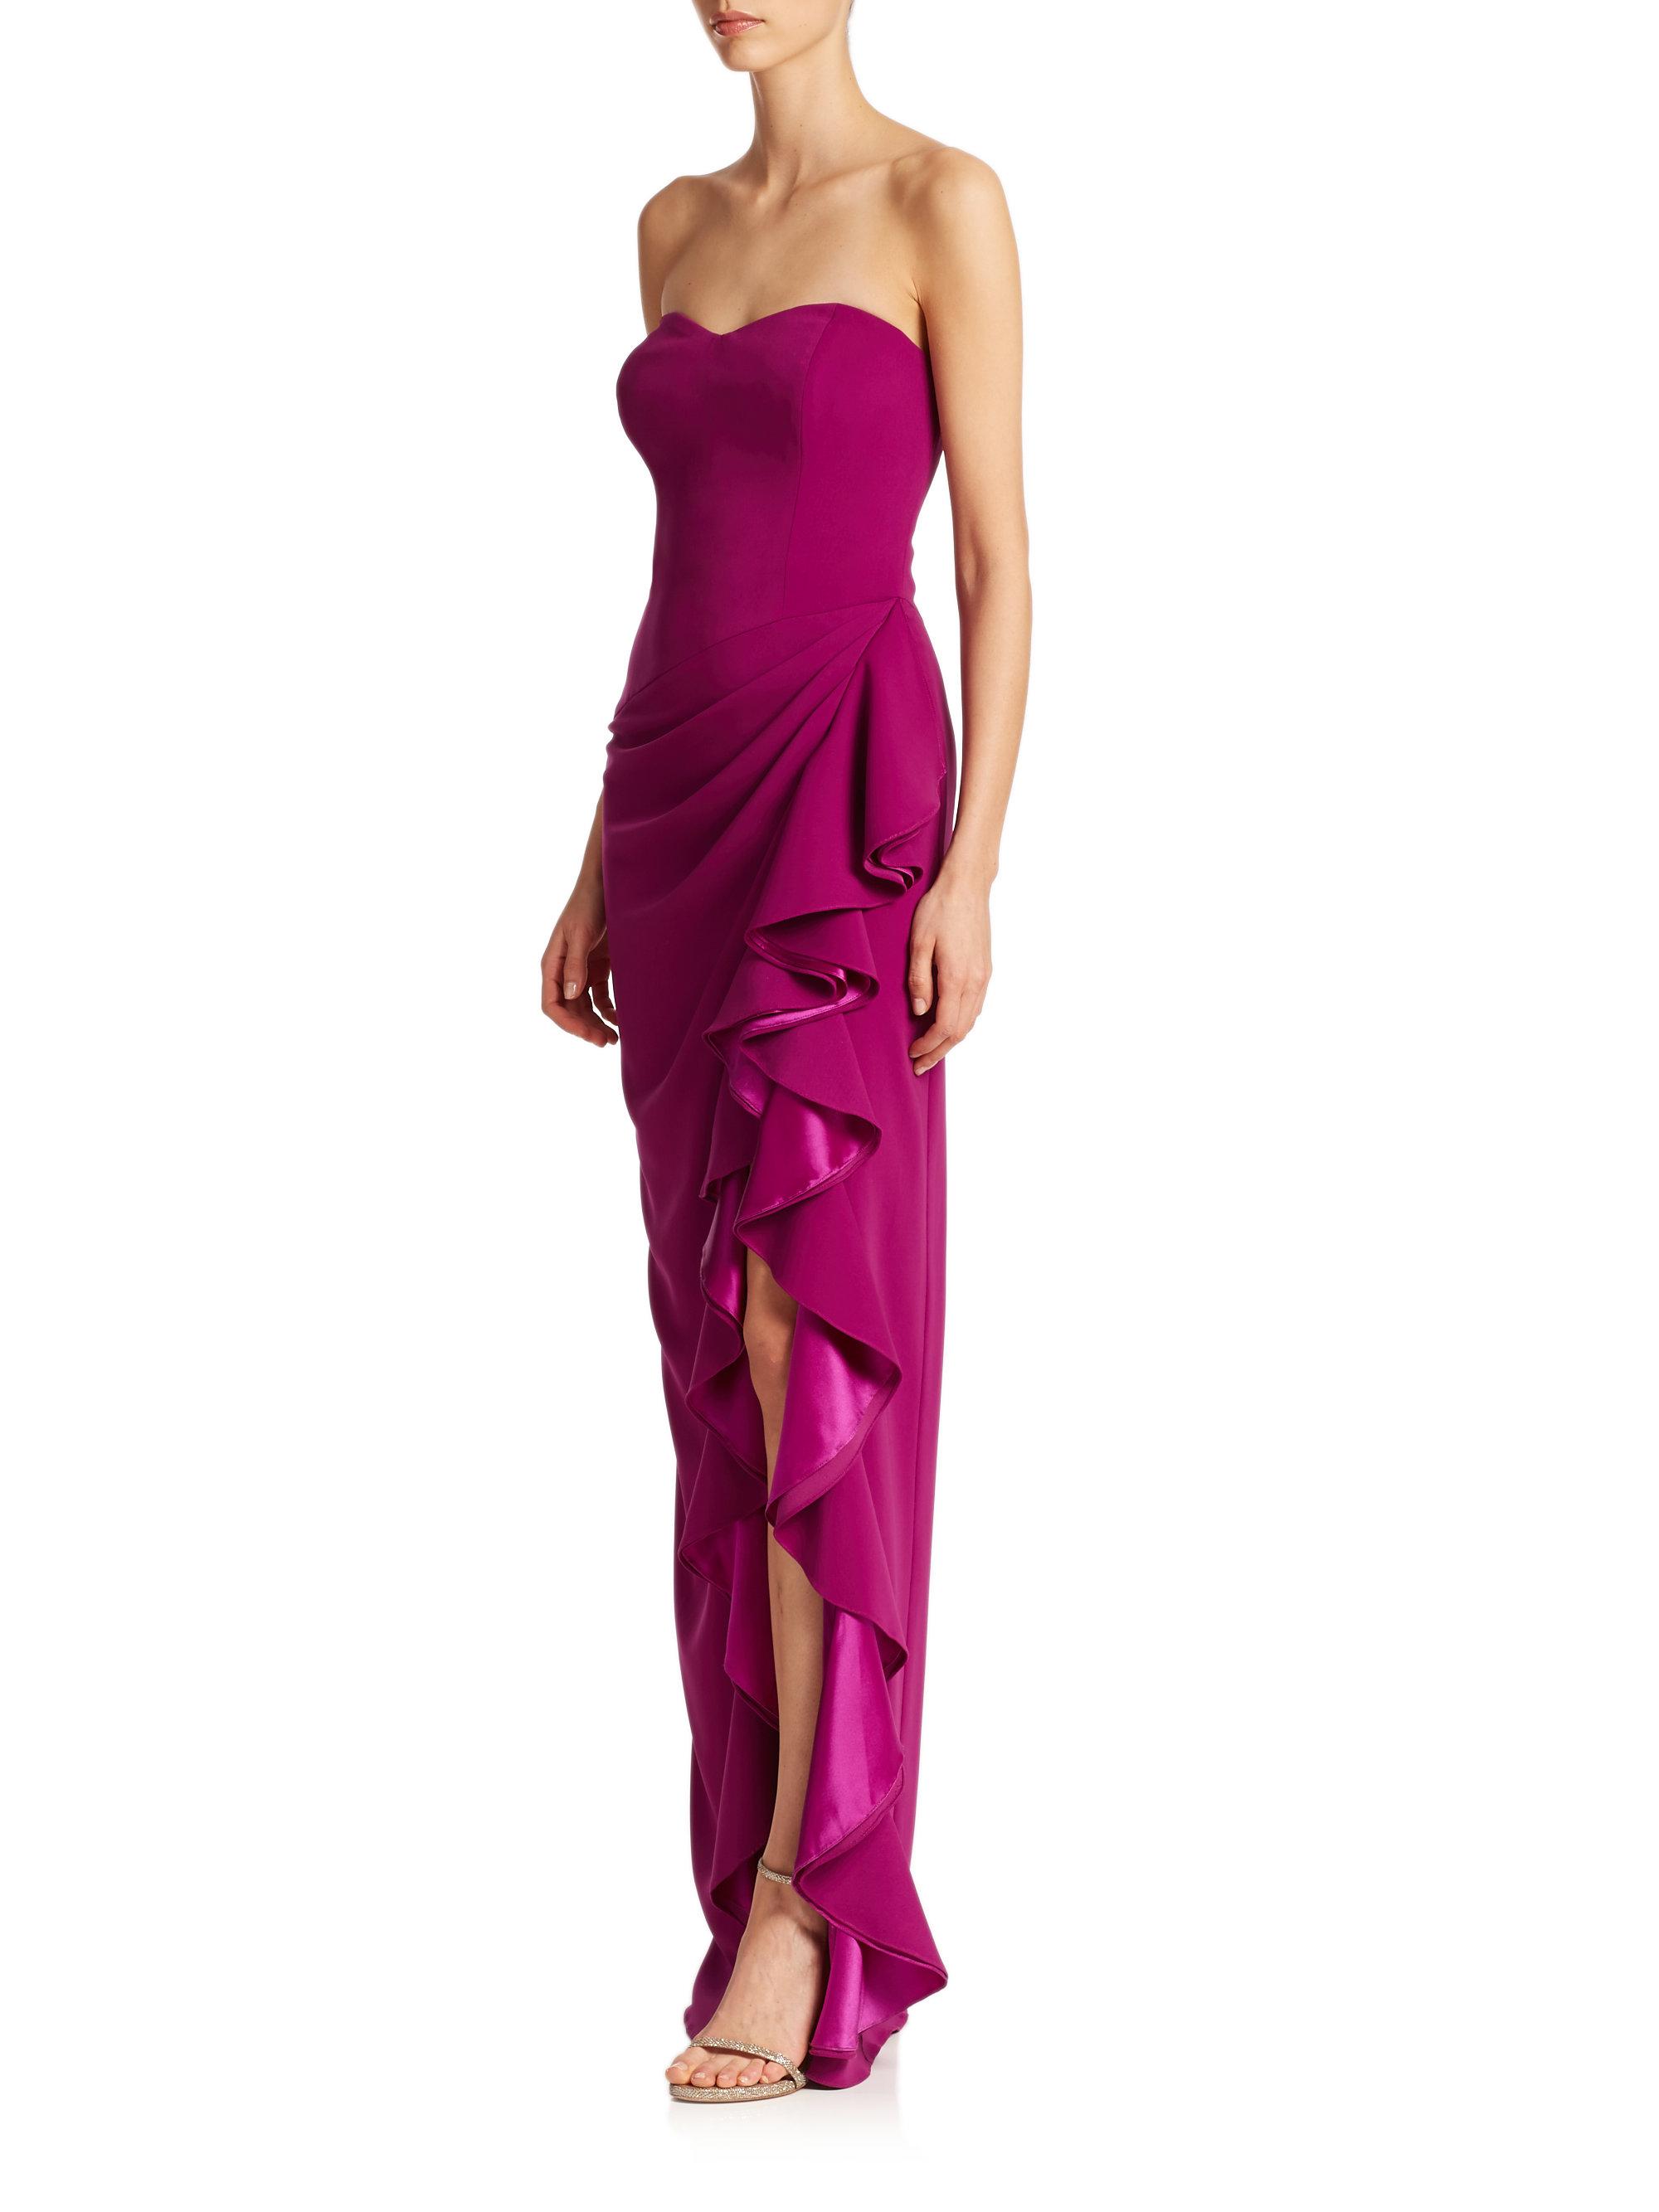 c7c381497cc9 Badgley Mischka Strapless Ruffled Gown in Purple - Lyst